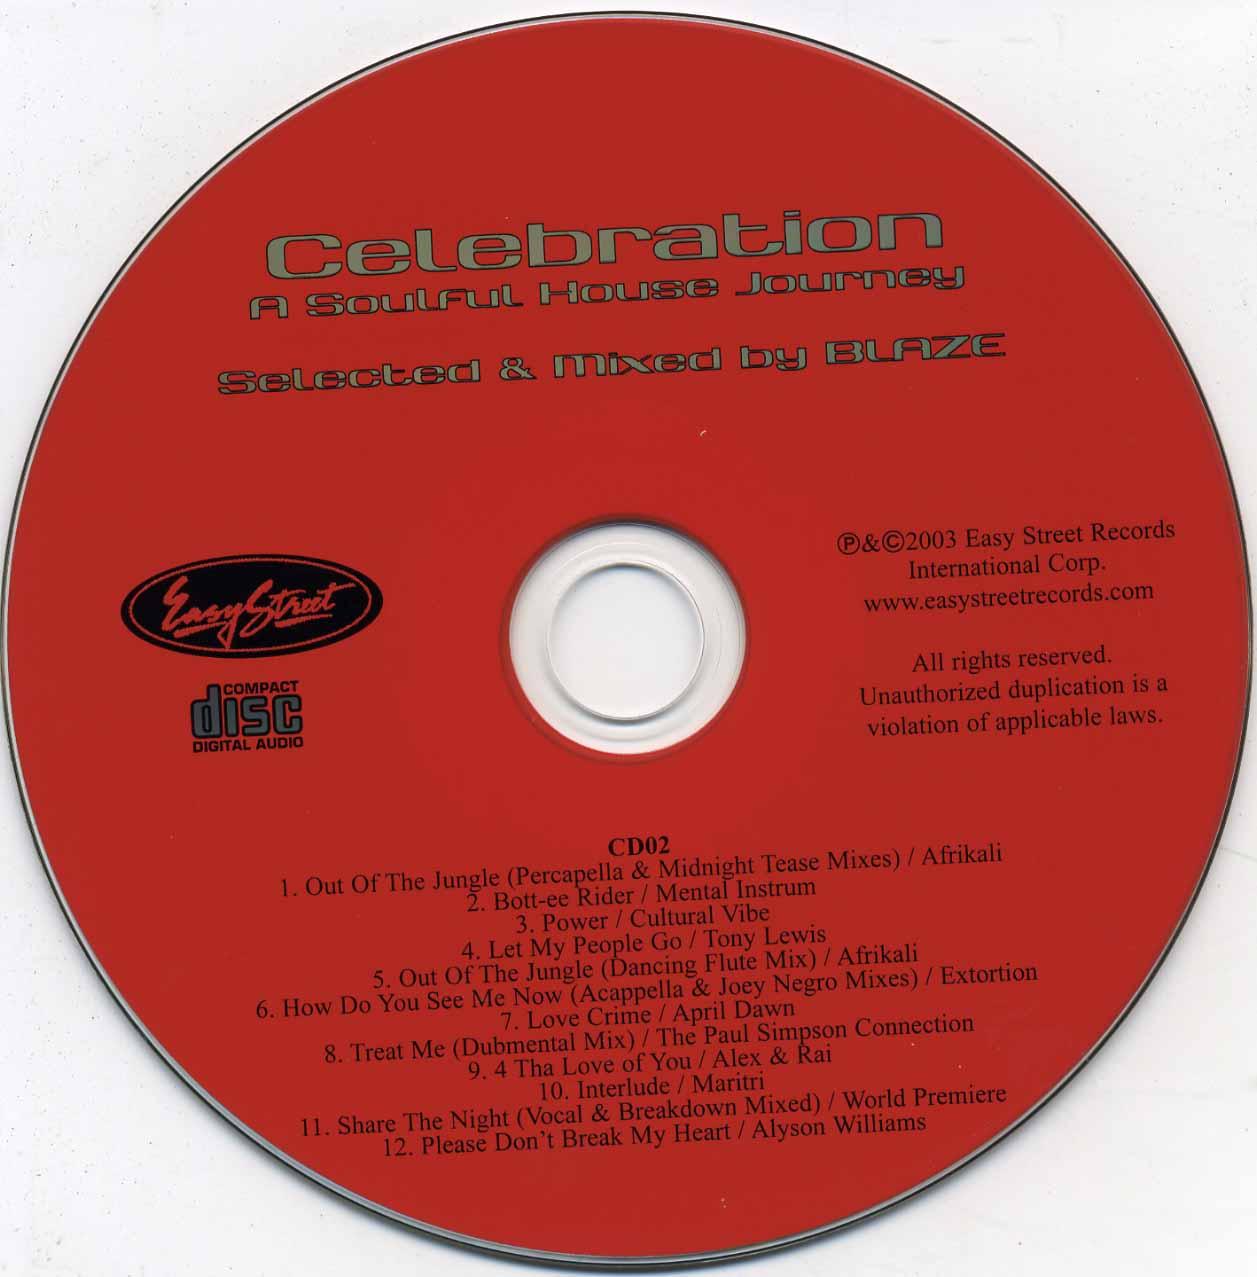 Scarica la copertina cd easy street dance classics for Classic house cd